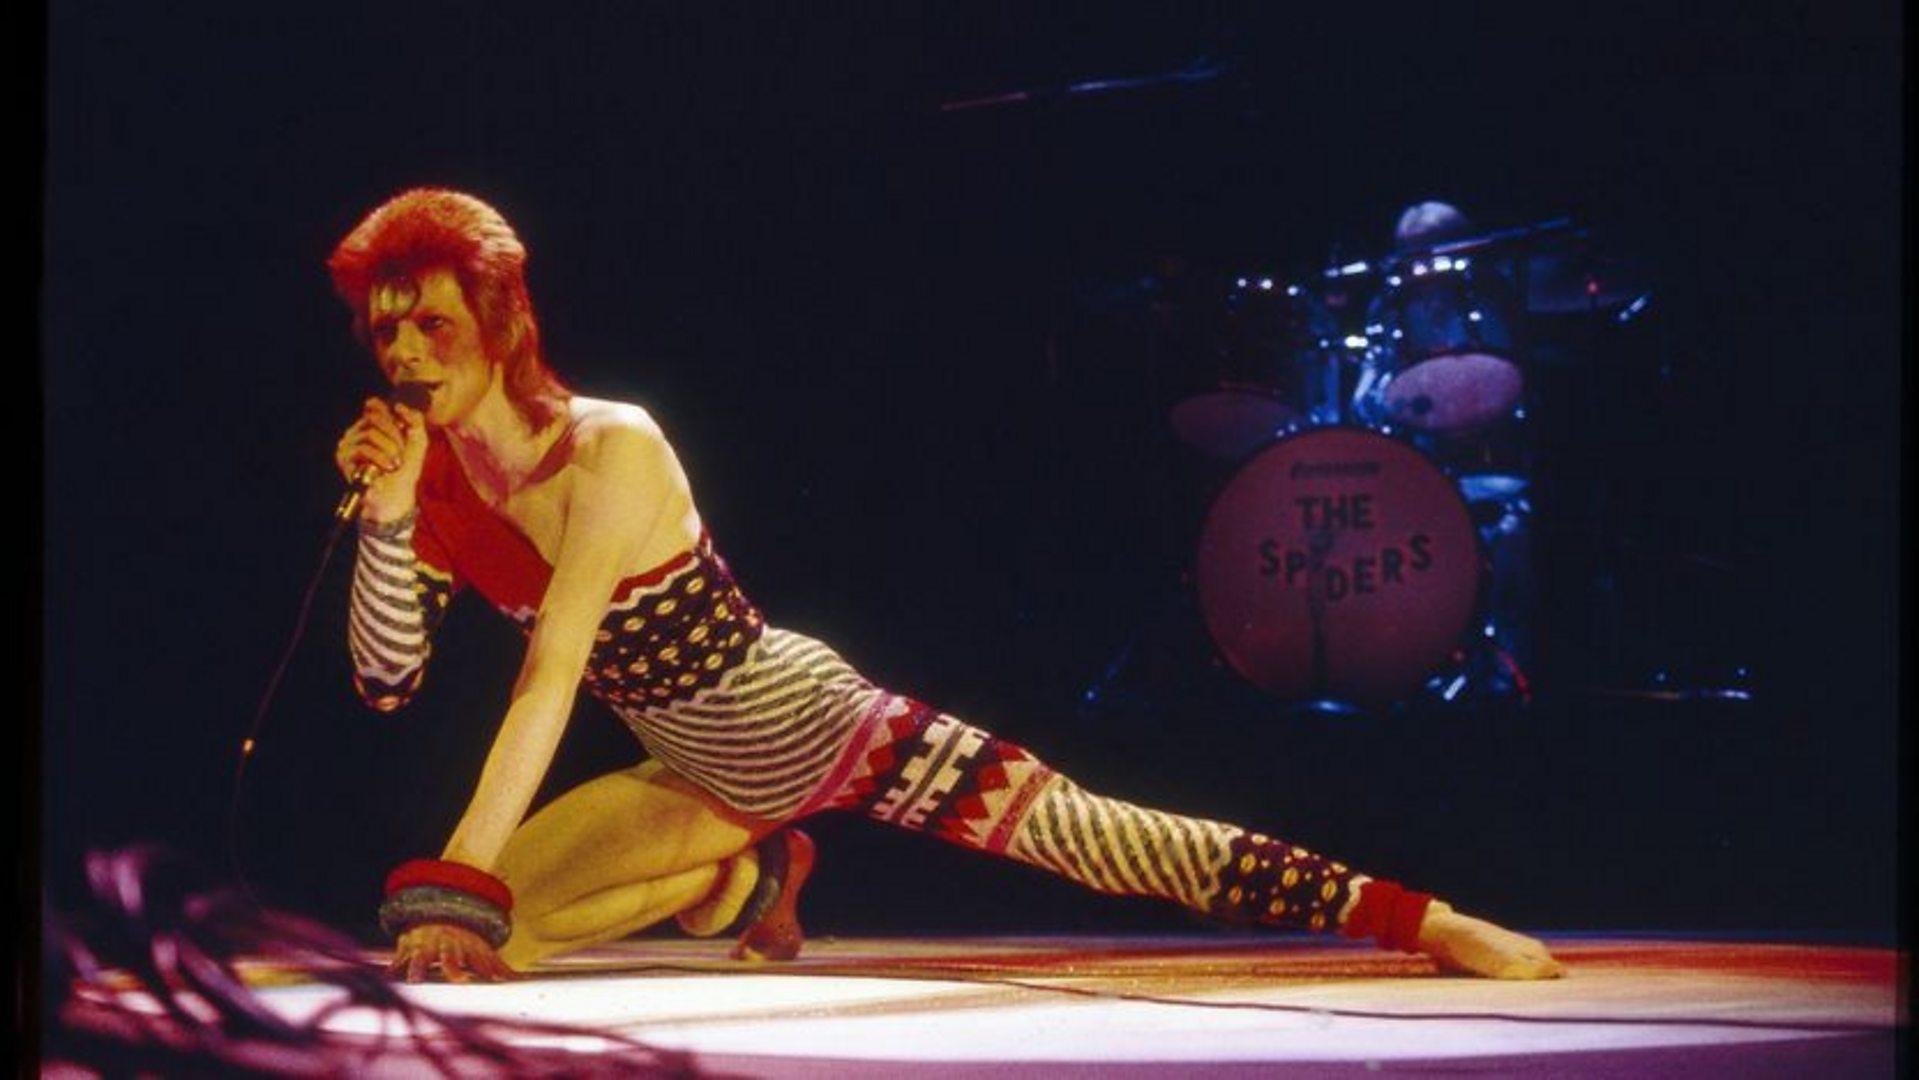 BBC Arts - BBC Arts - David Bowie: 10 key career moments